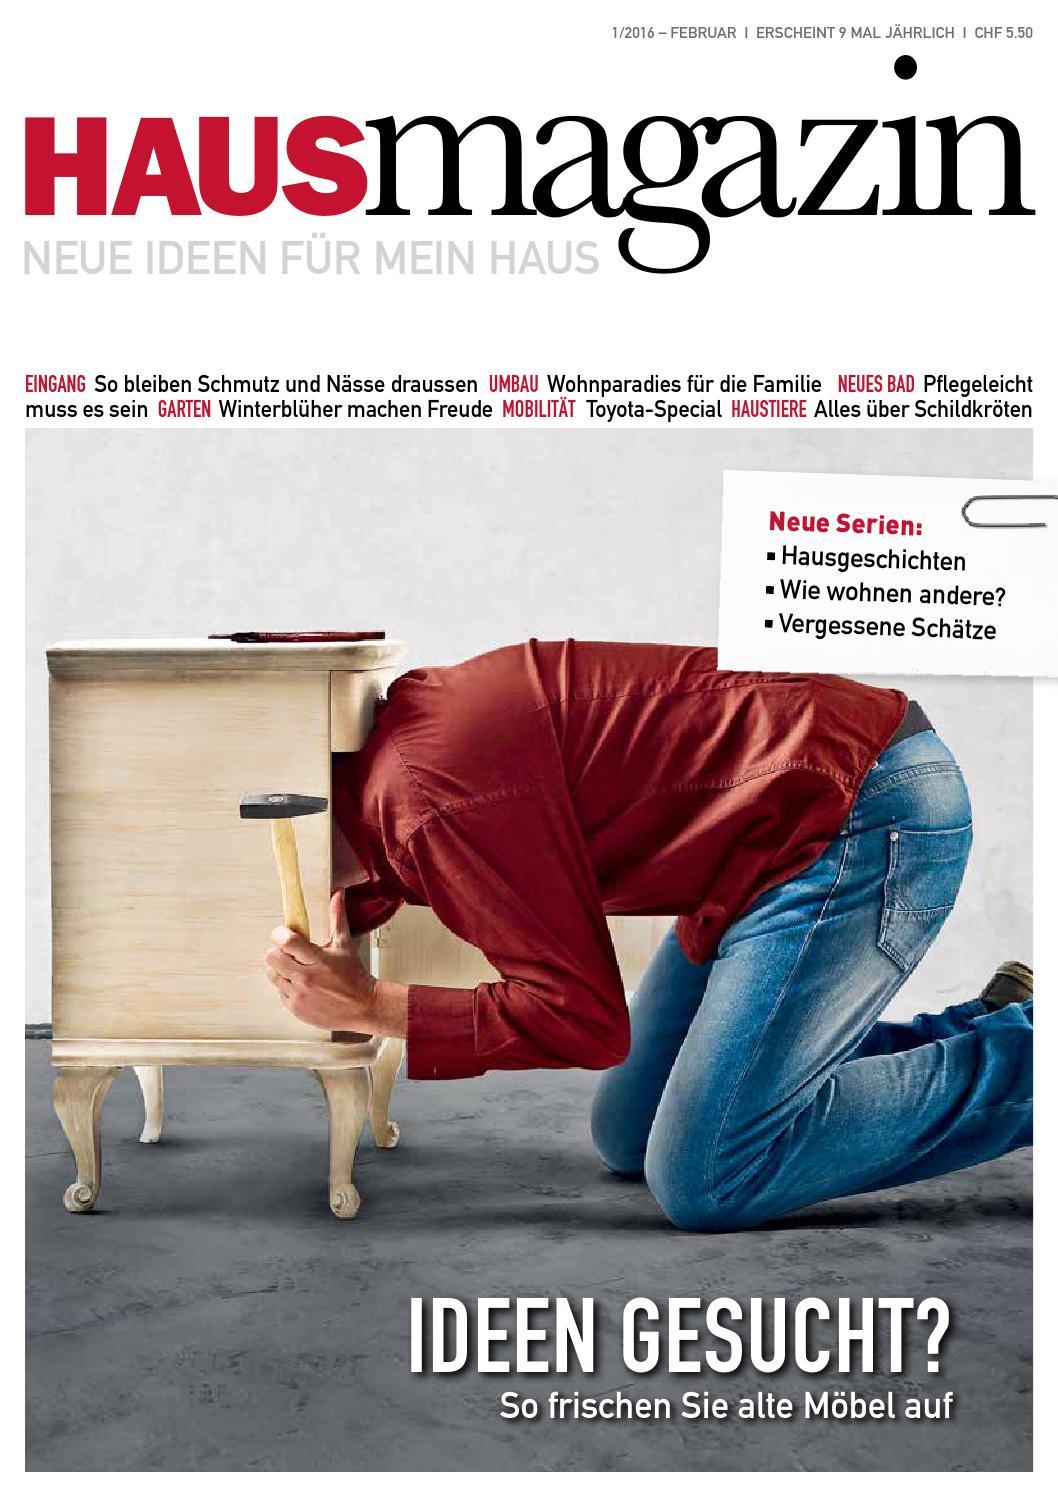 Hausmagazin Februar 2016 by HAUS MAGAZIN - issuu